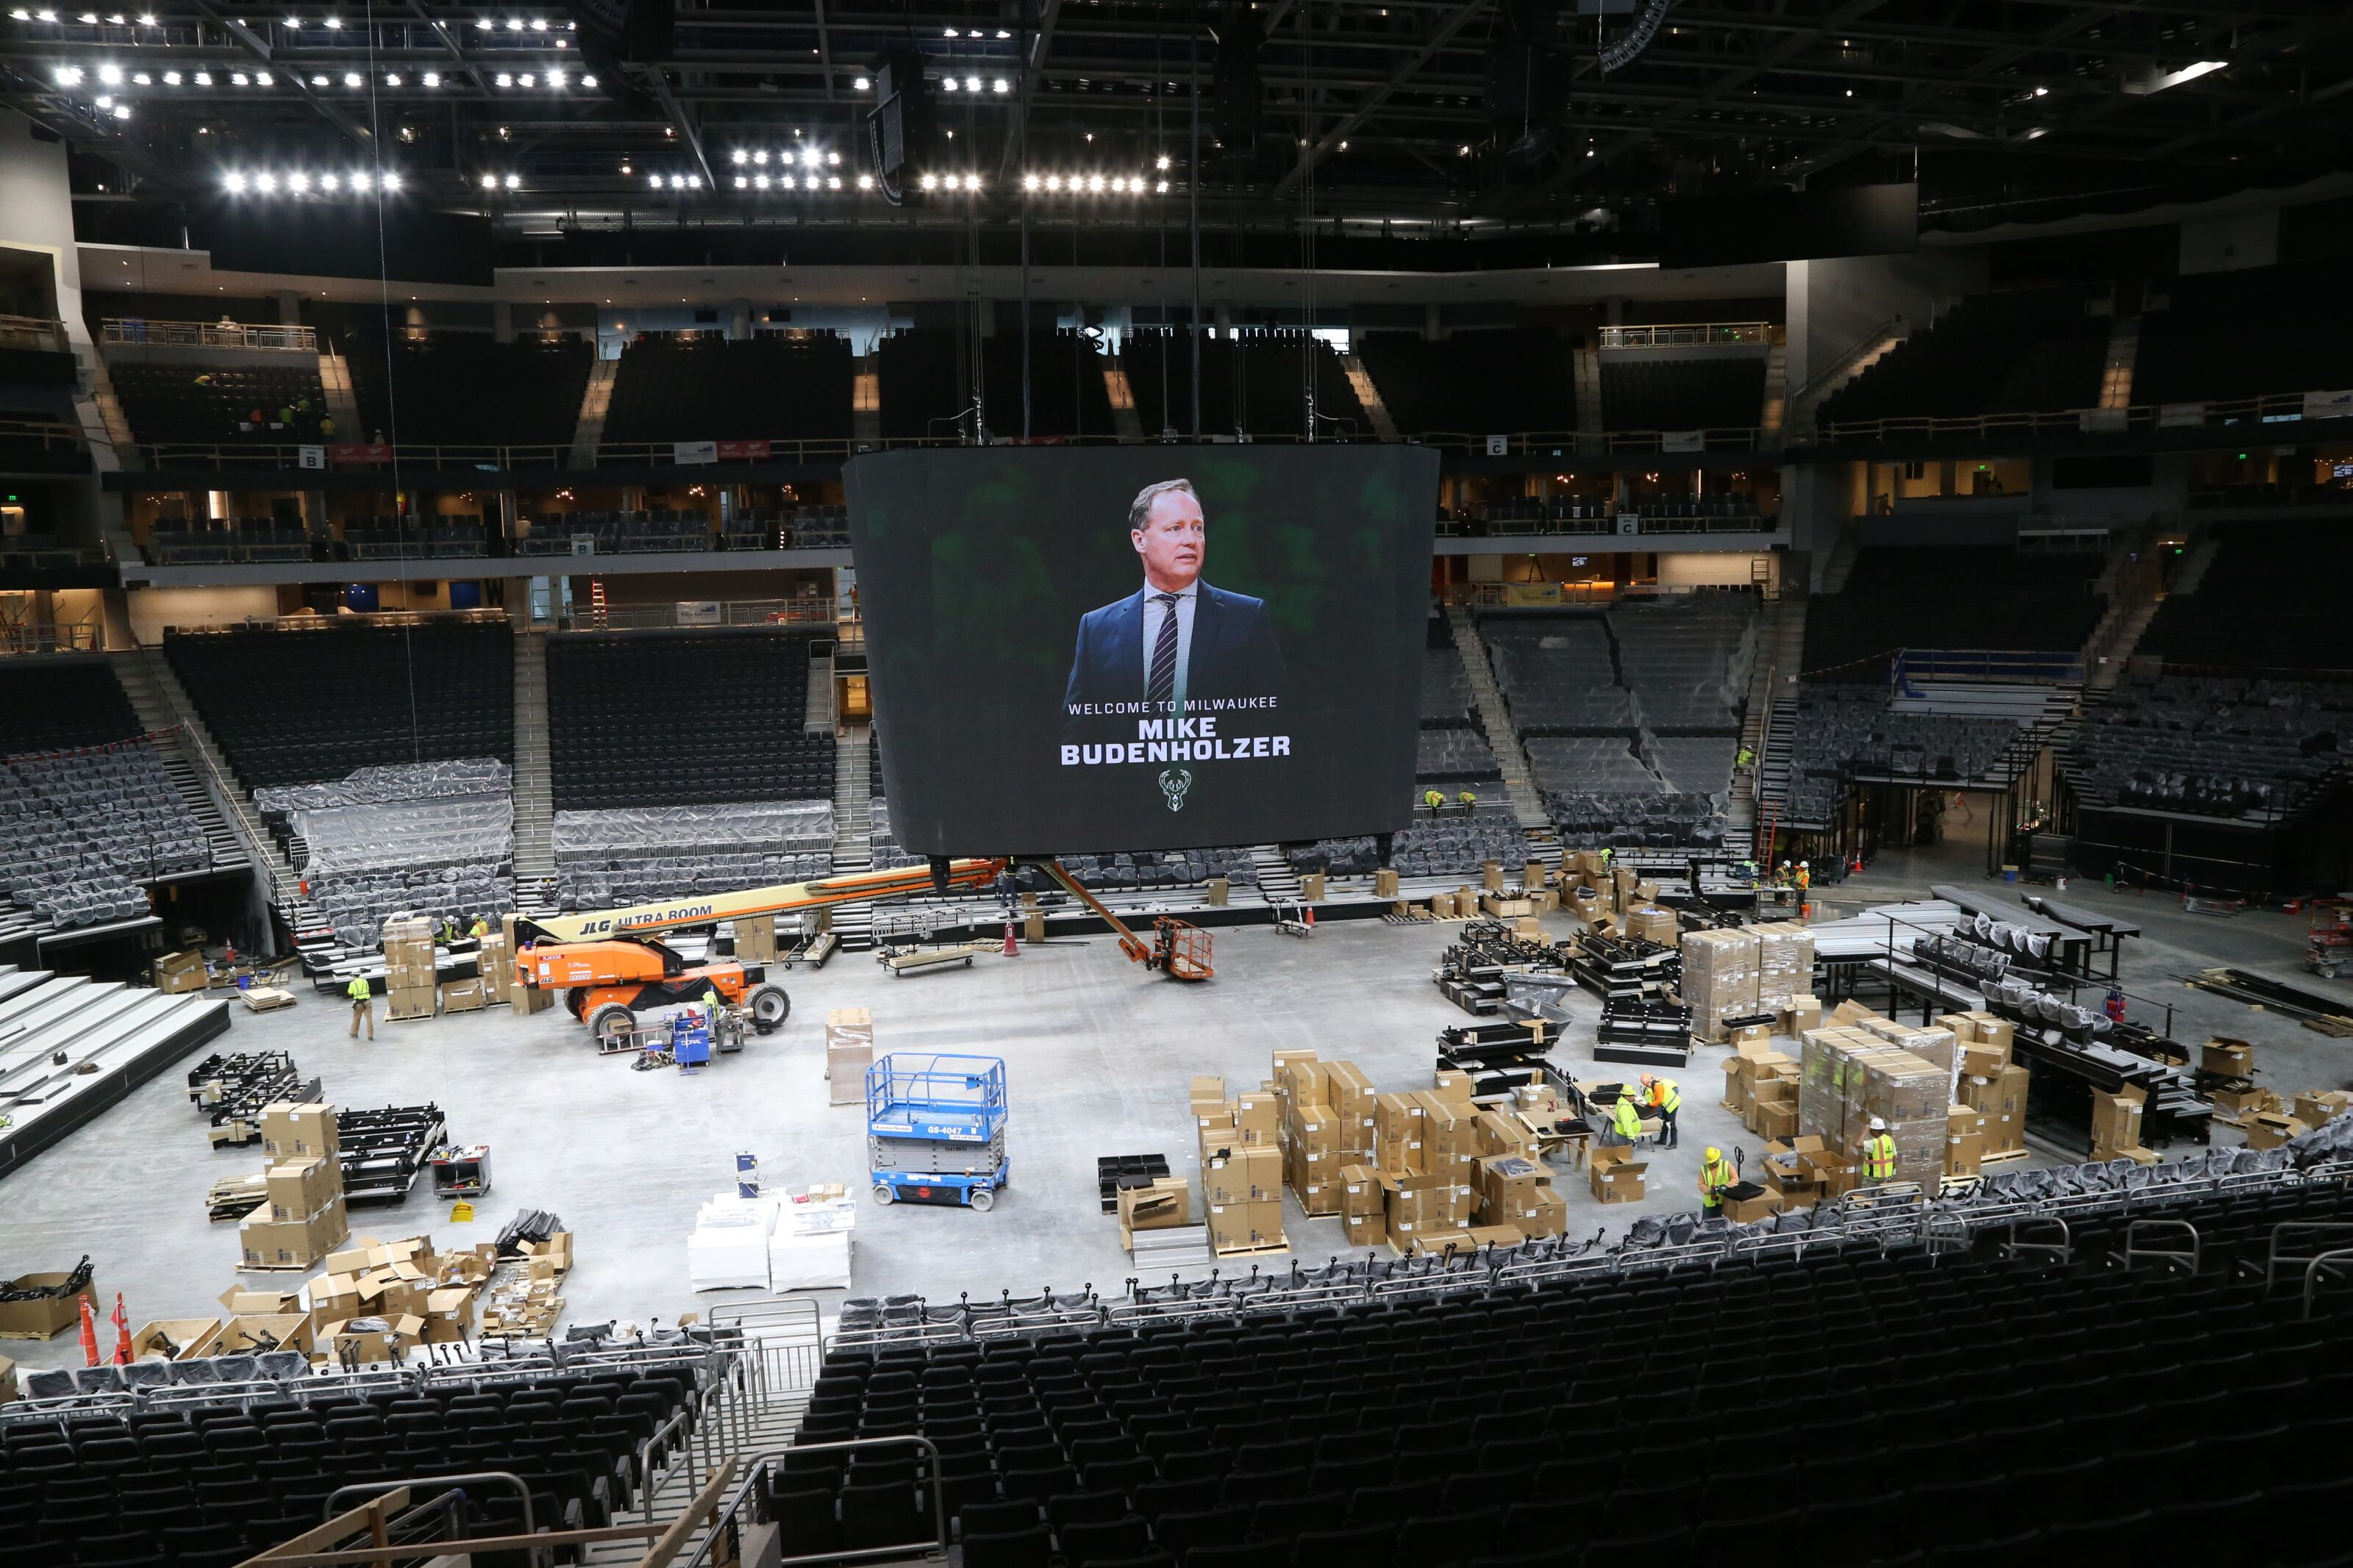 Milwaukee Bucks Daily: New arena progress in photos